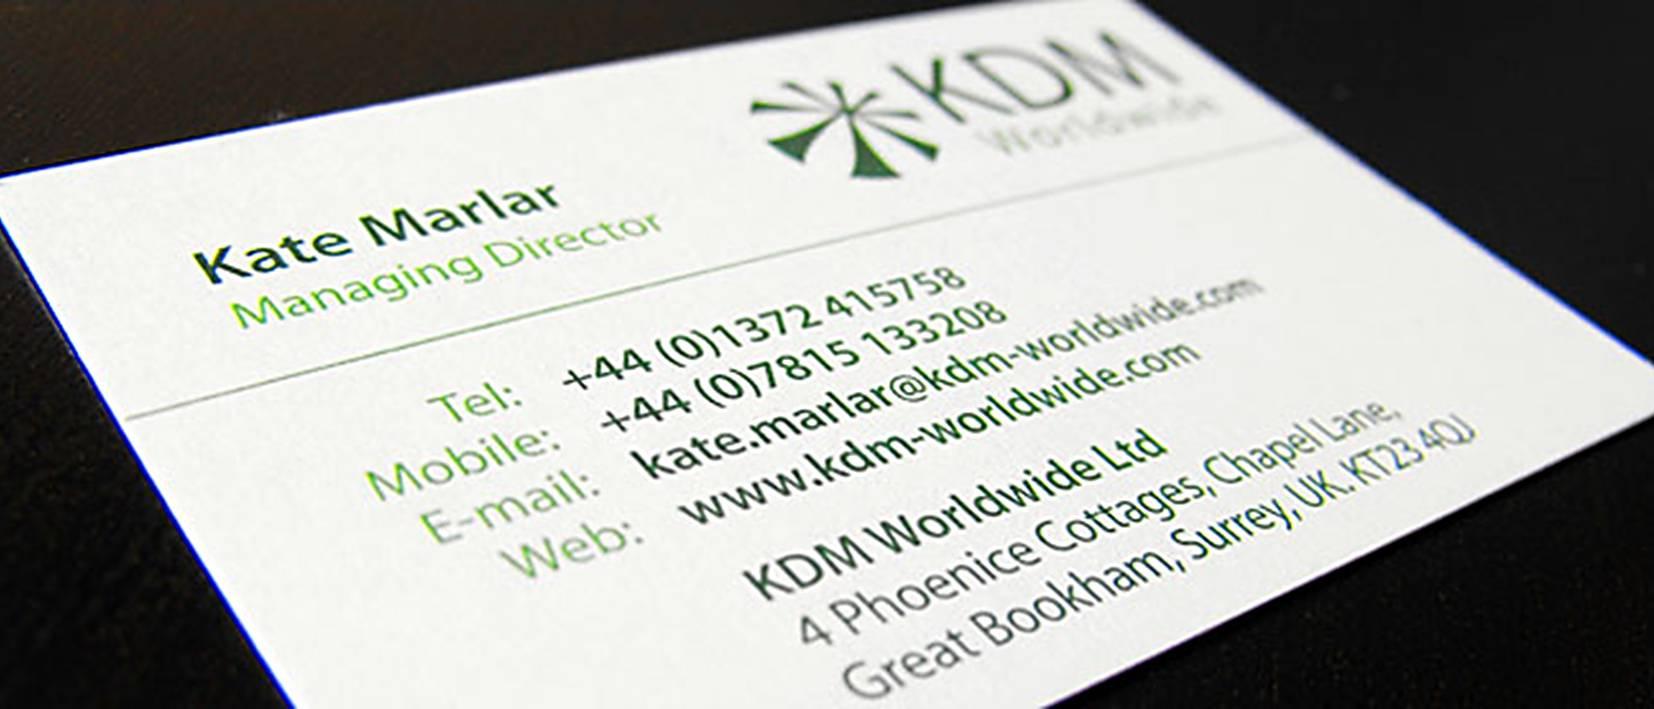 kdm client business card back